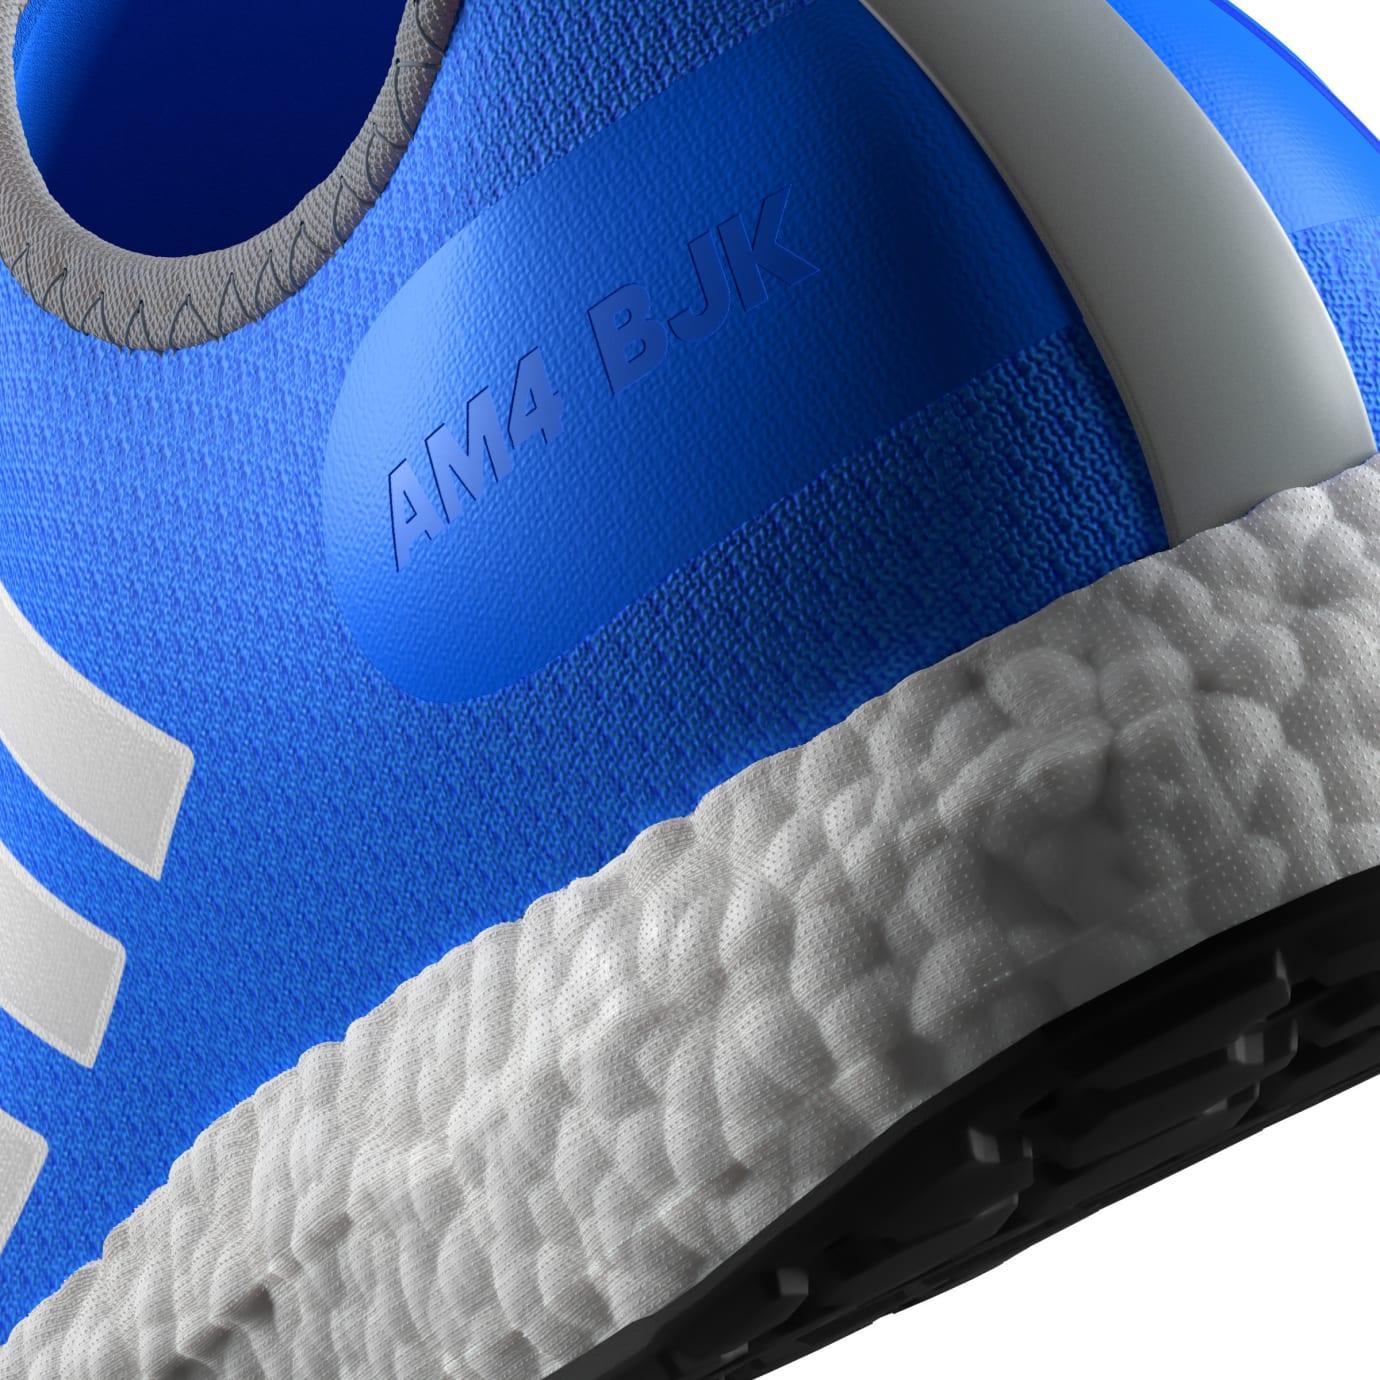 Billie Jean King Adidas Speedfactory AM4 2